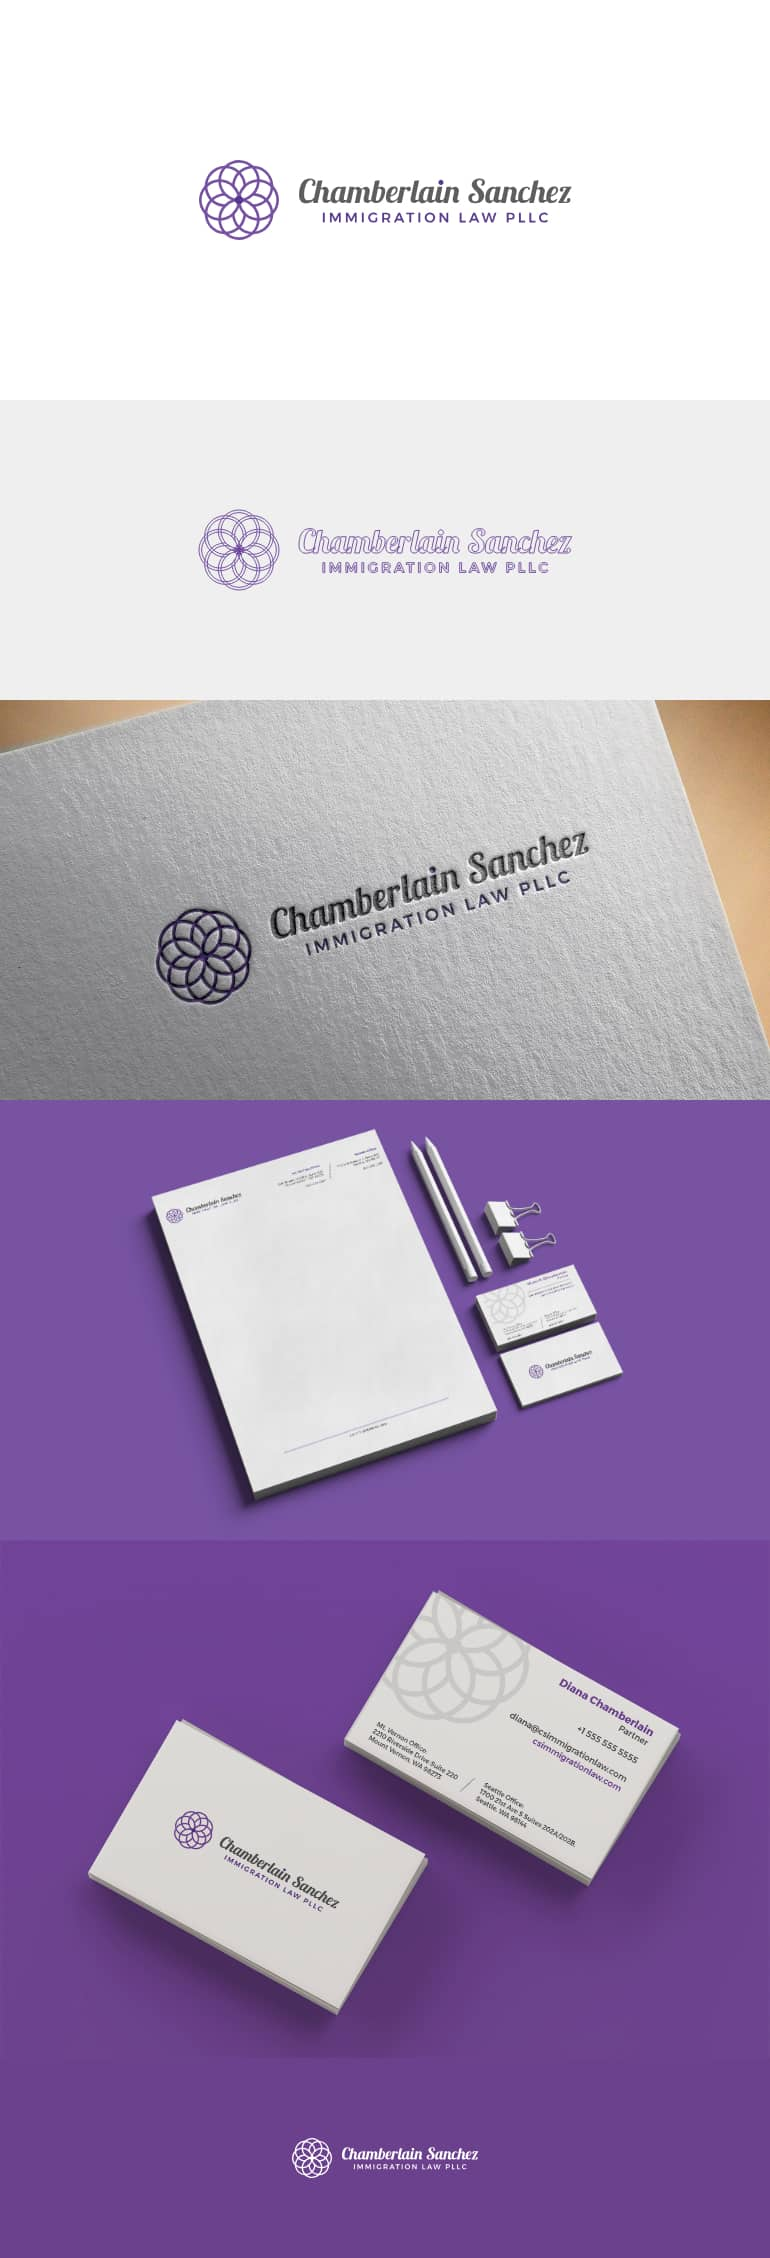 Chamberlain Sanchez identity development